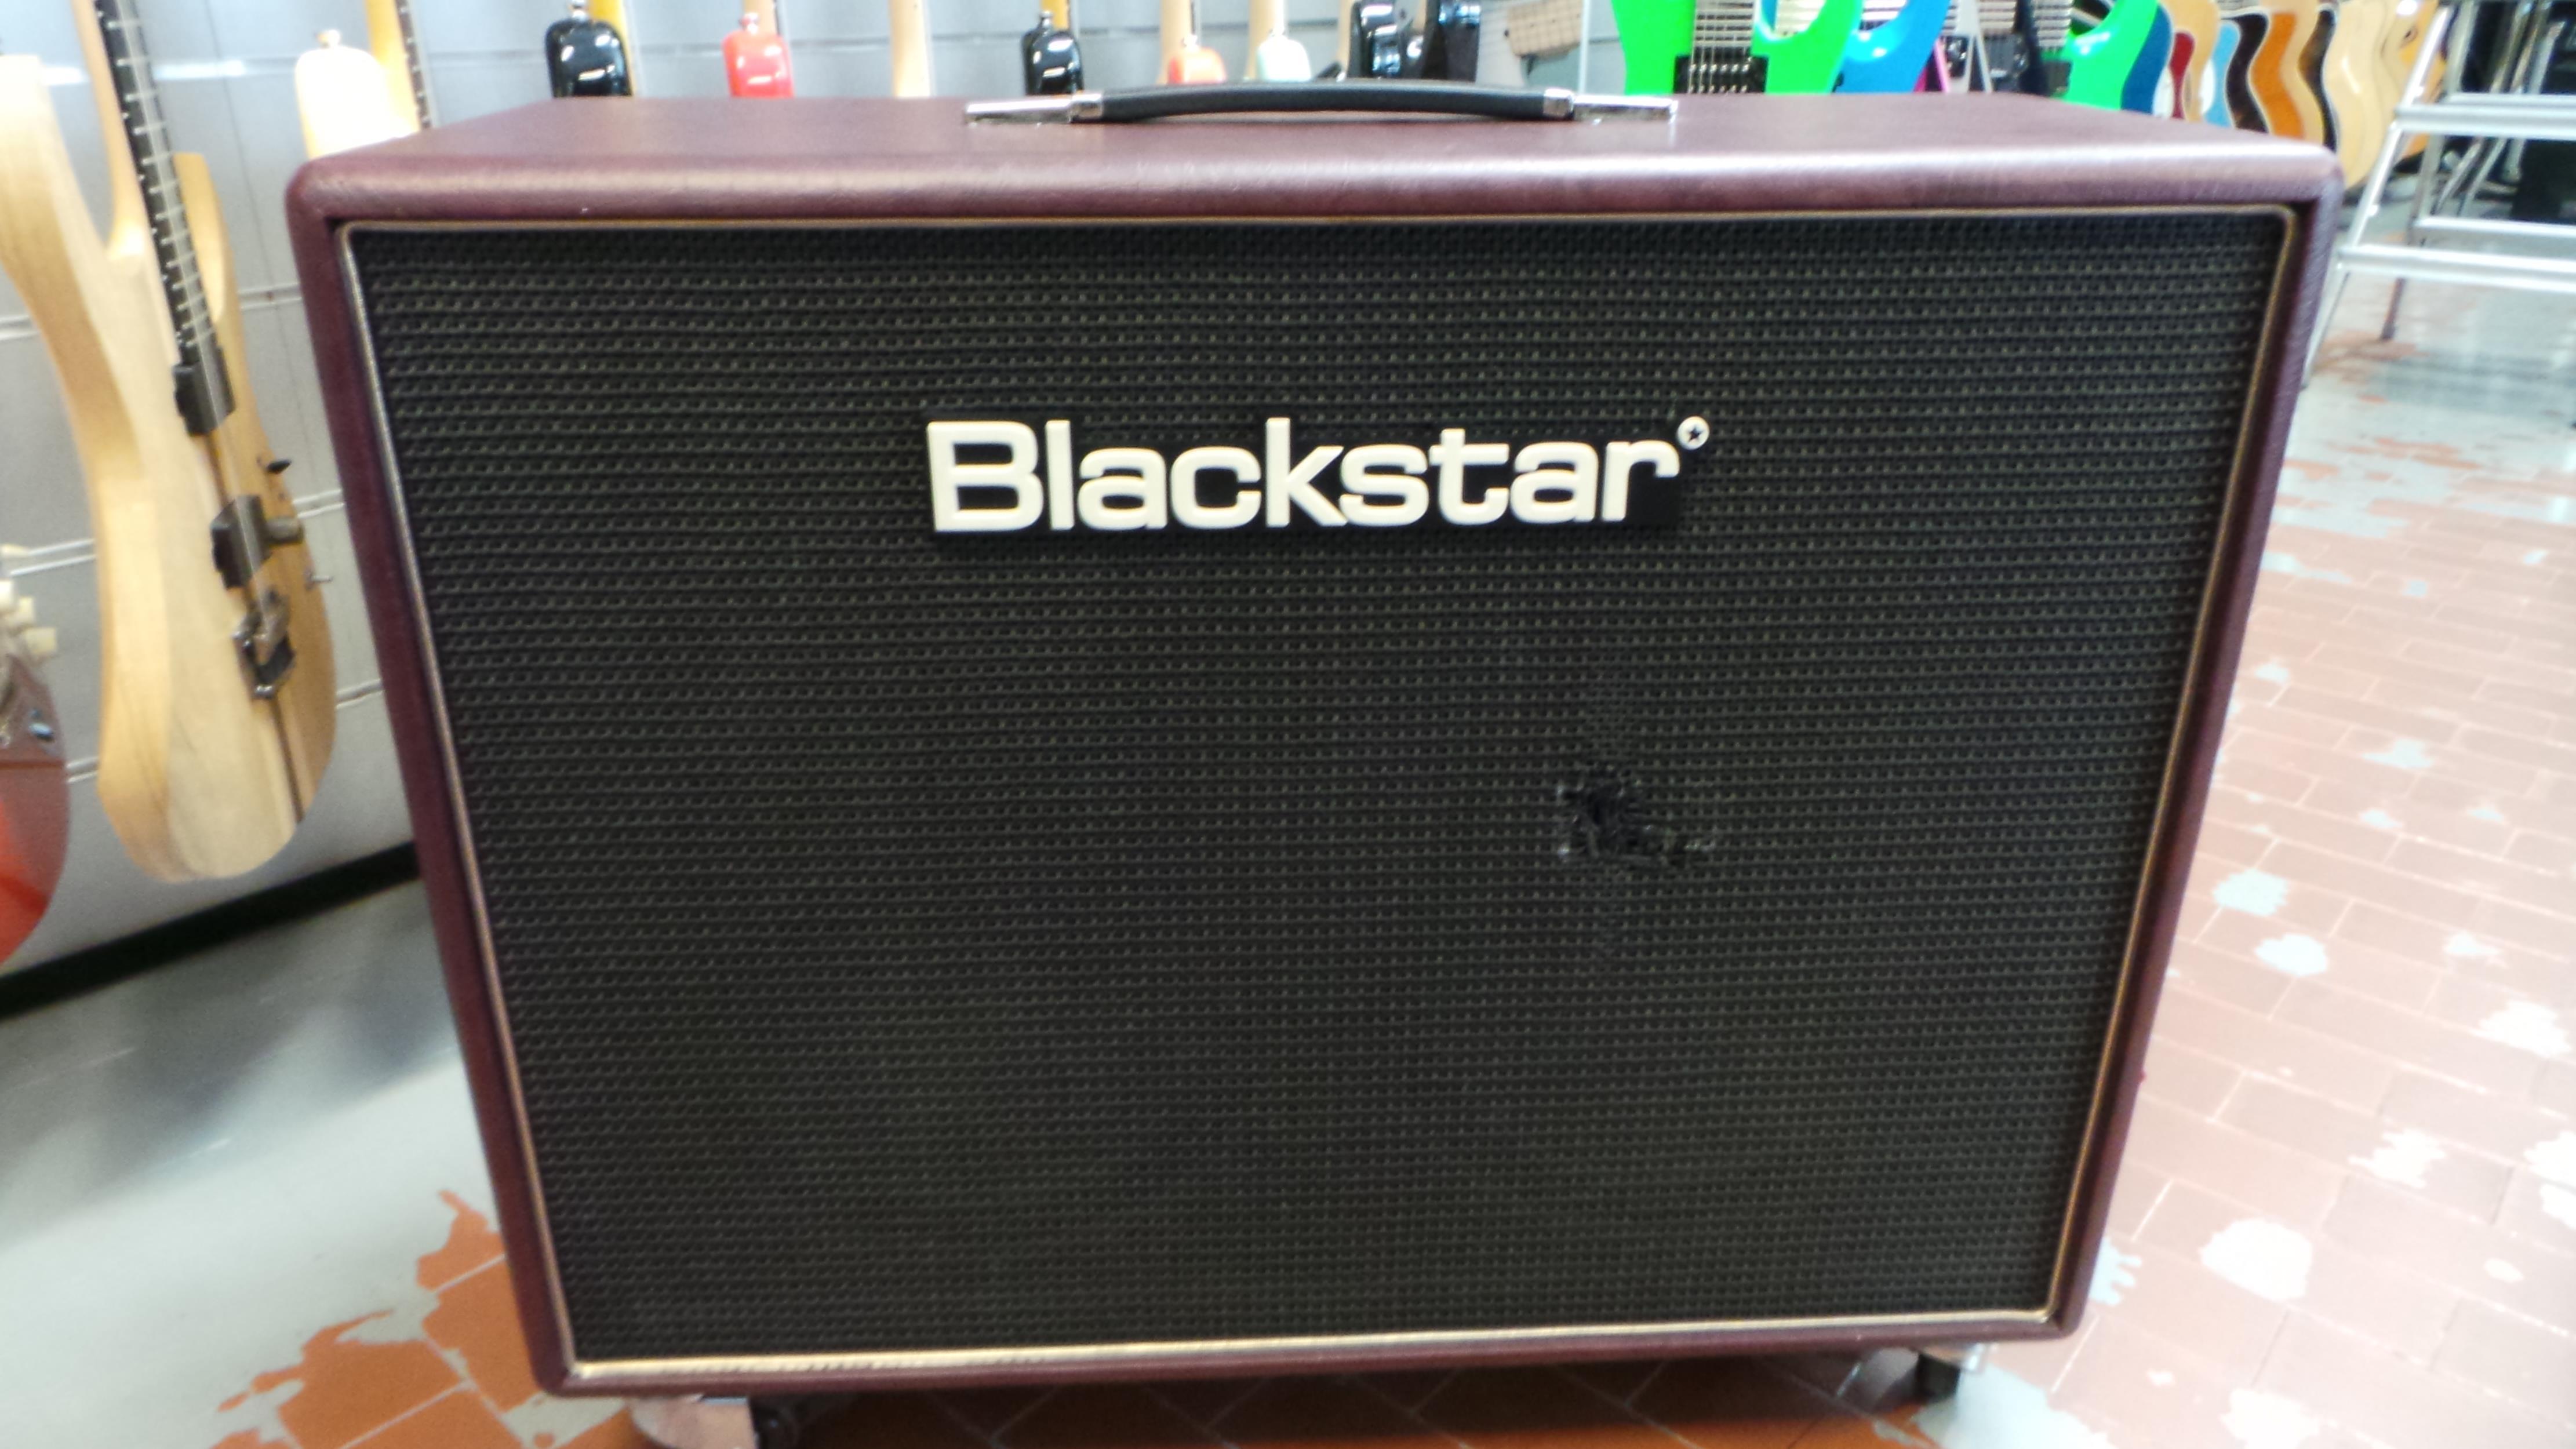 BLACKSTAR ARTISAN 212 ..